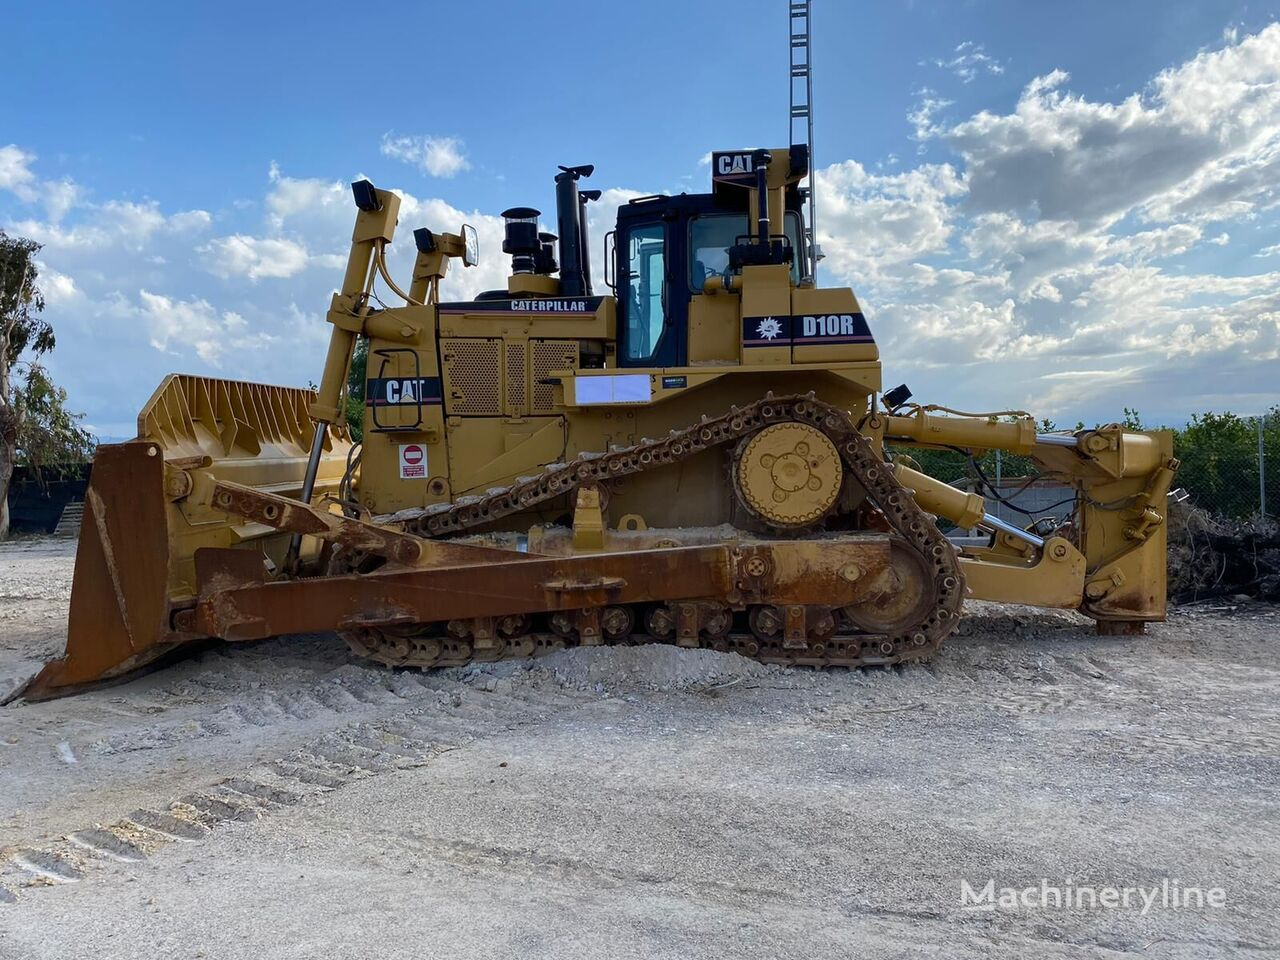 CATERPILLAR D 10 R bulldozer